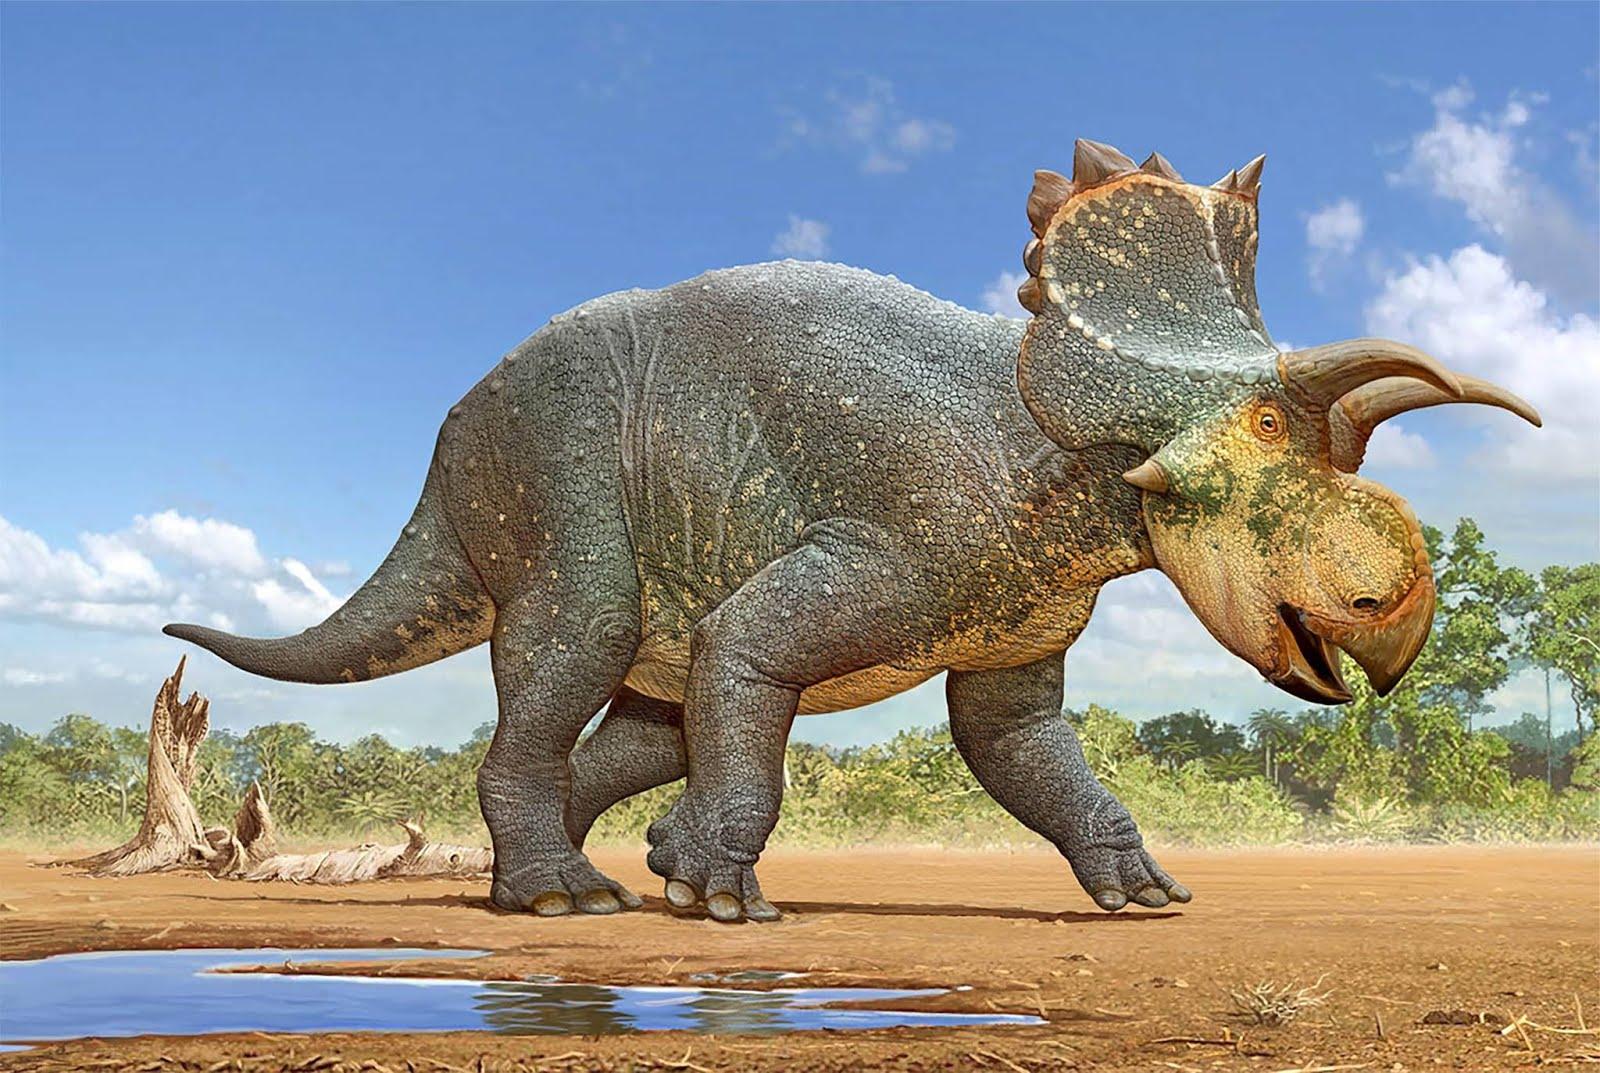 crittendenceratops_krzyzanowskii_sergey_krasovskiy.jpg